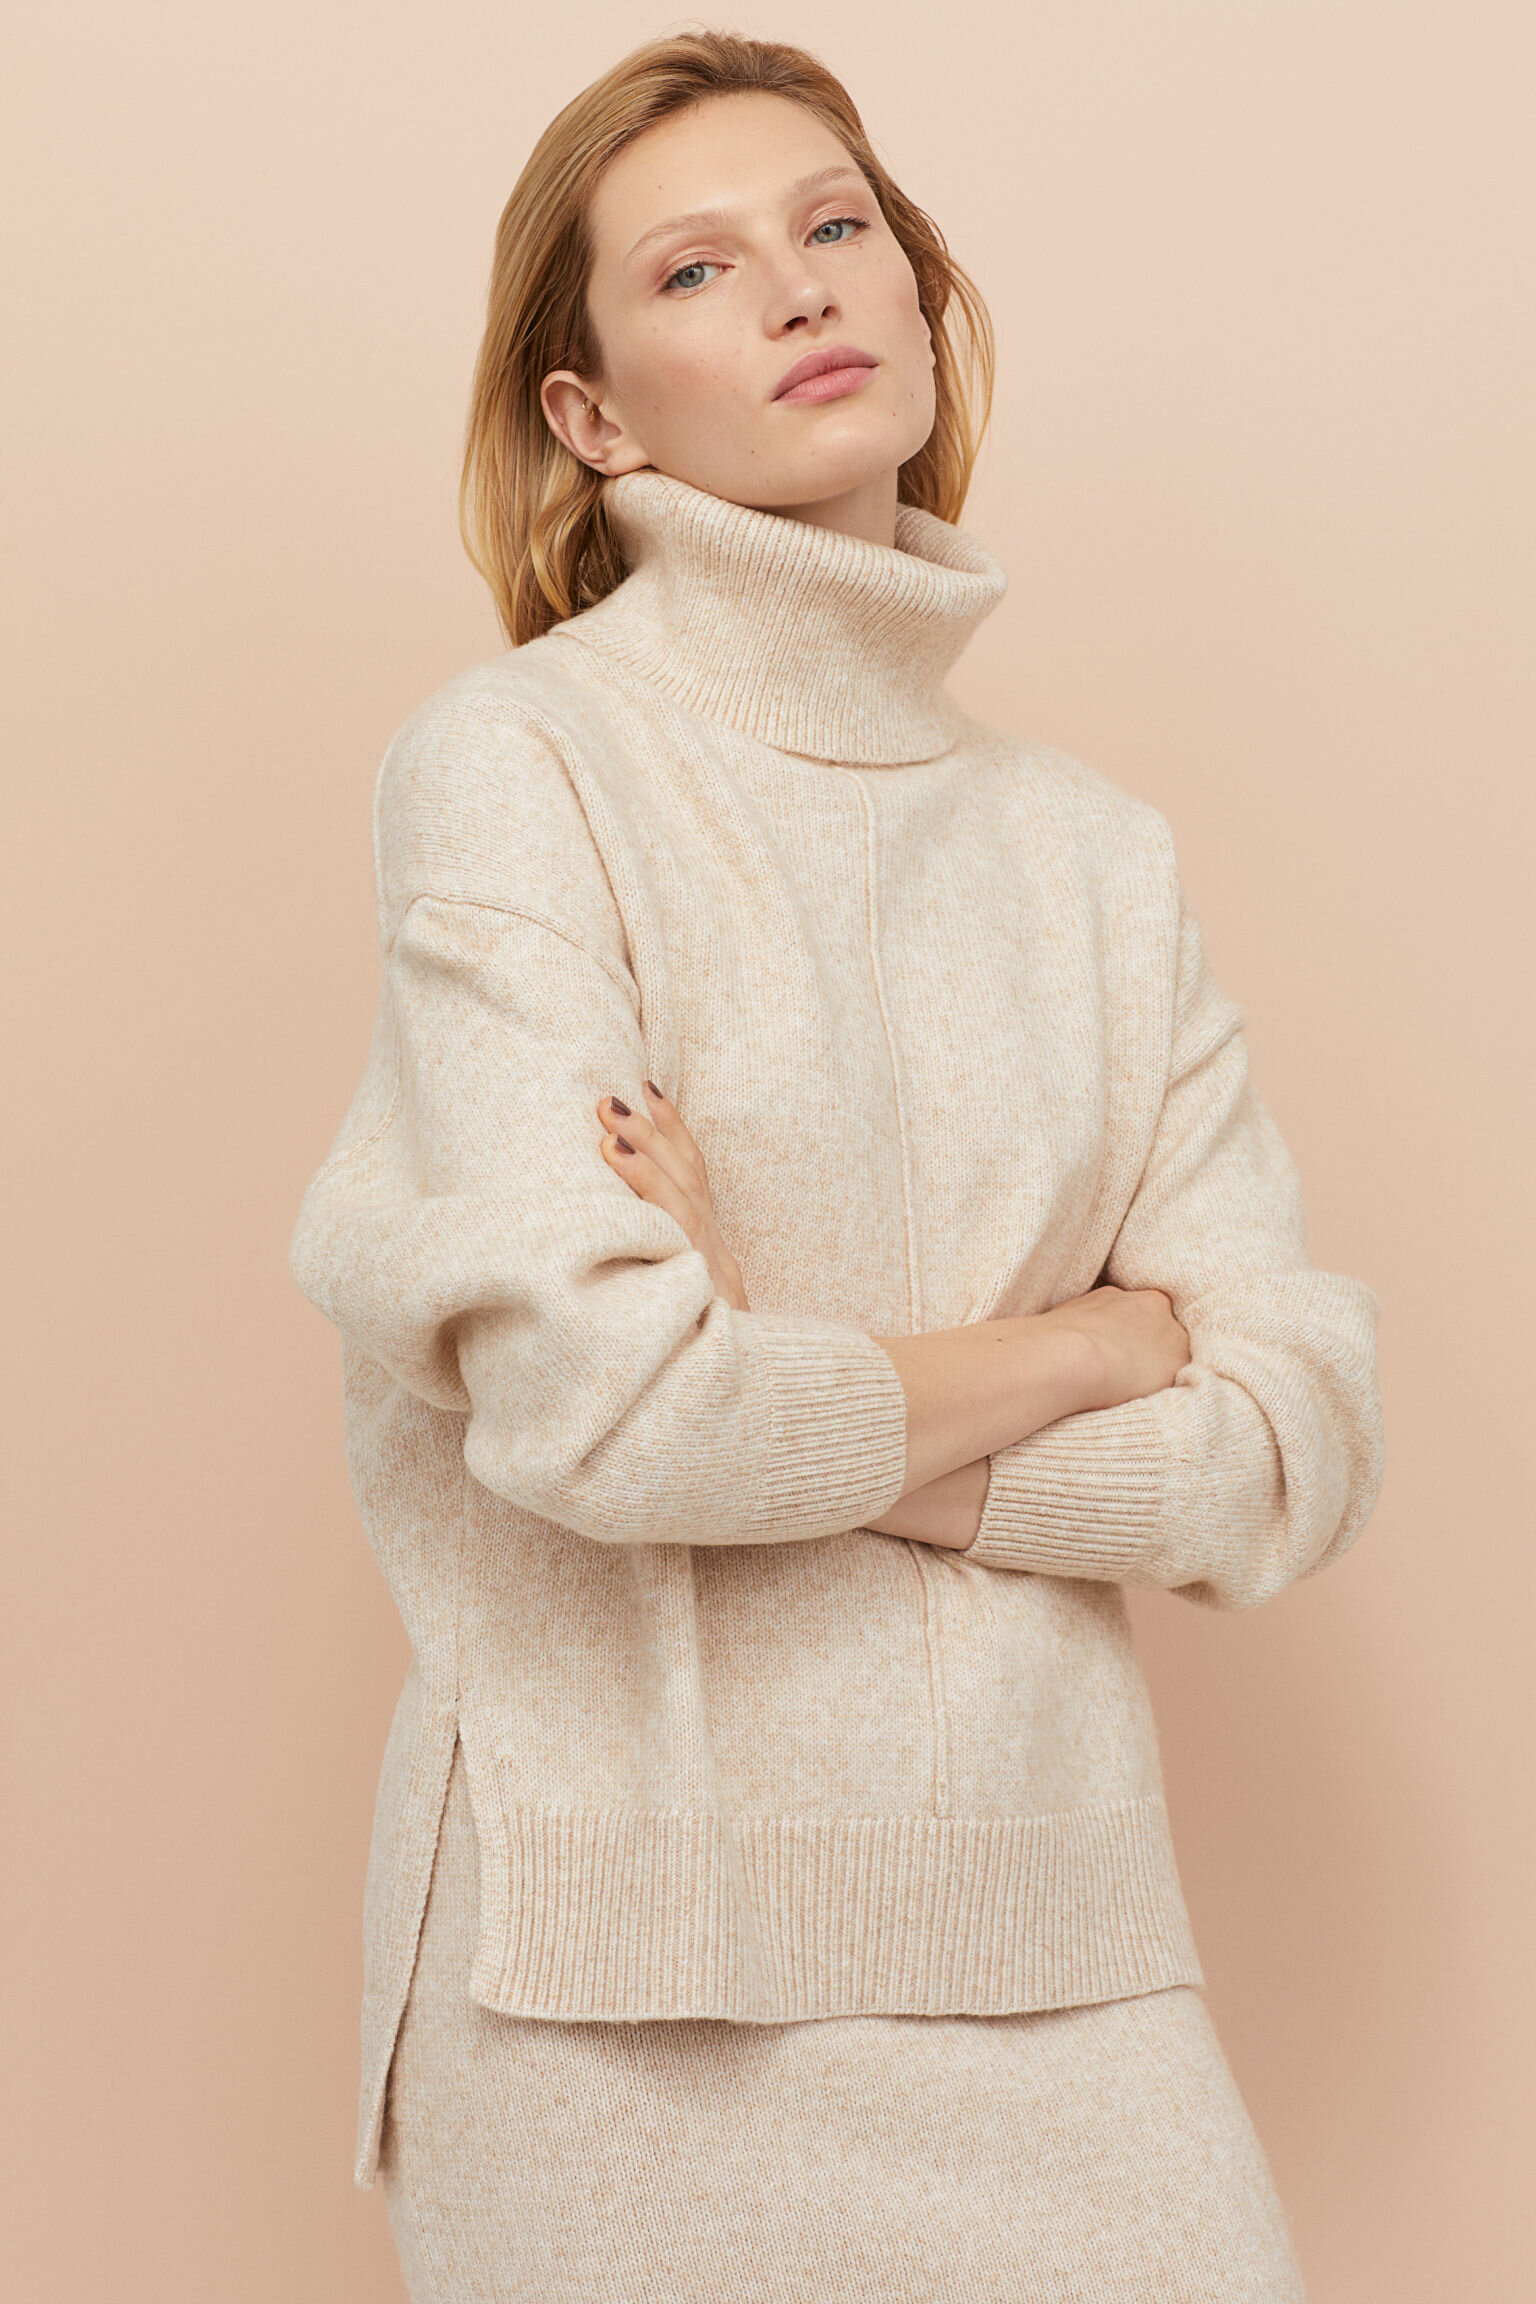 H&M Sweater $34.99